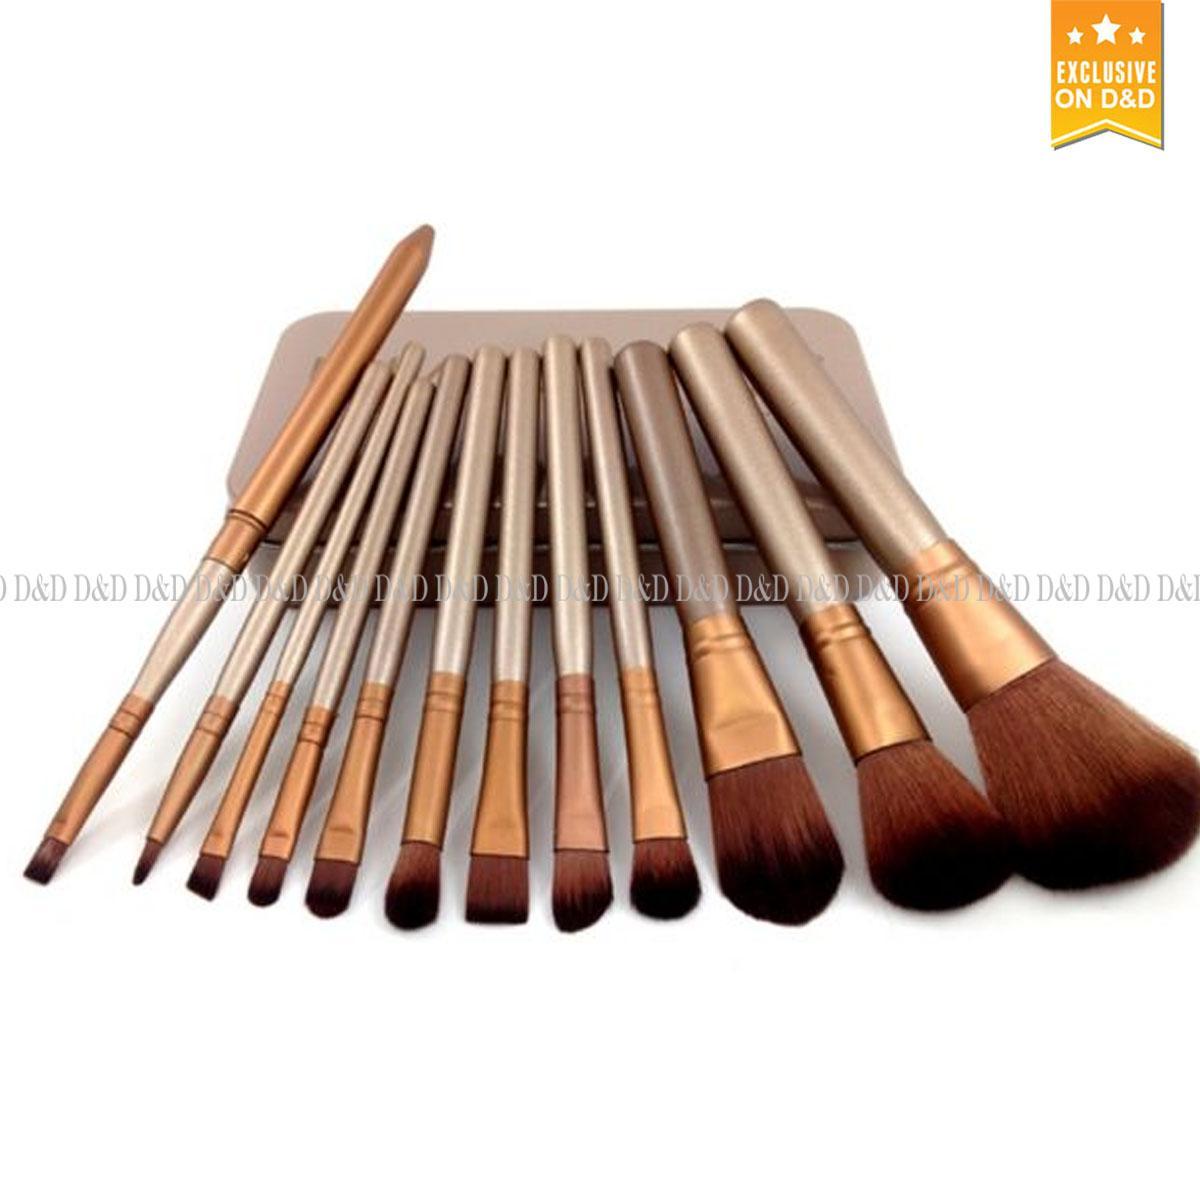 D D 12 Pcs Professional Make Up Brushes Set (Gold) 976439ef607a